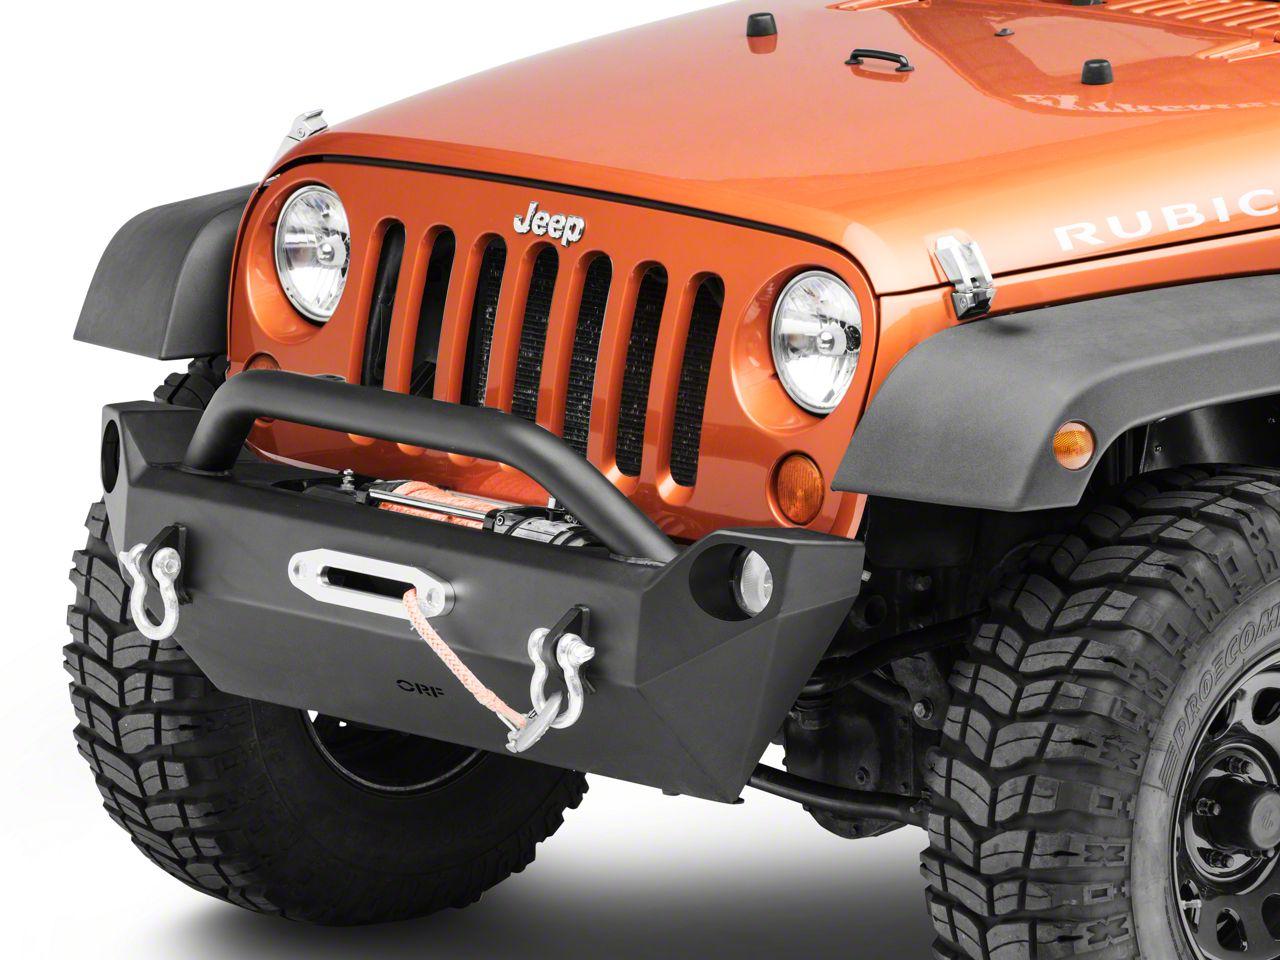 OR-Fab Mid-Width Front Bumper (07-18 Jeep Wrangler JK)